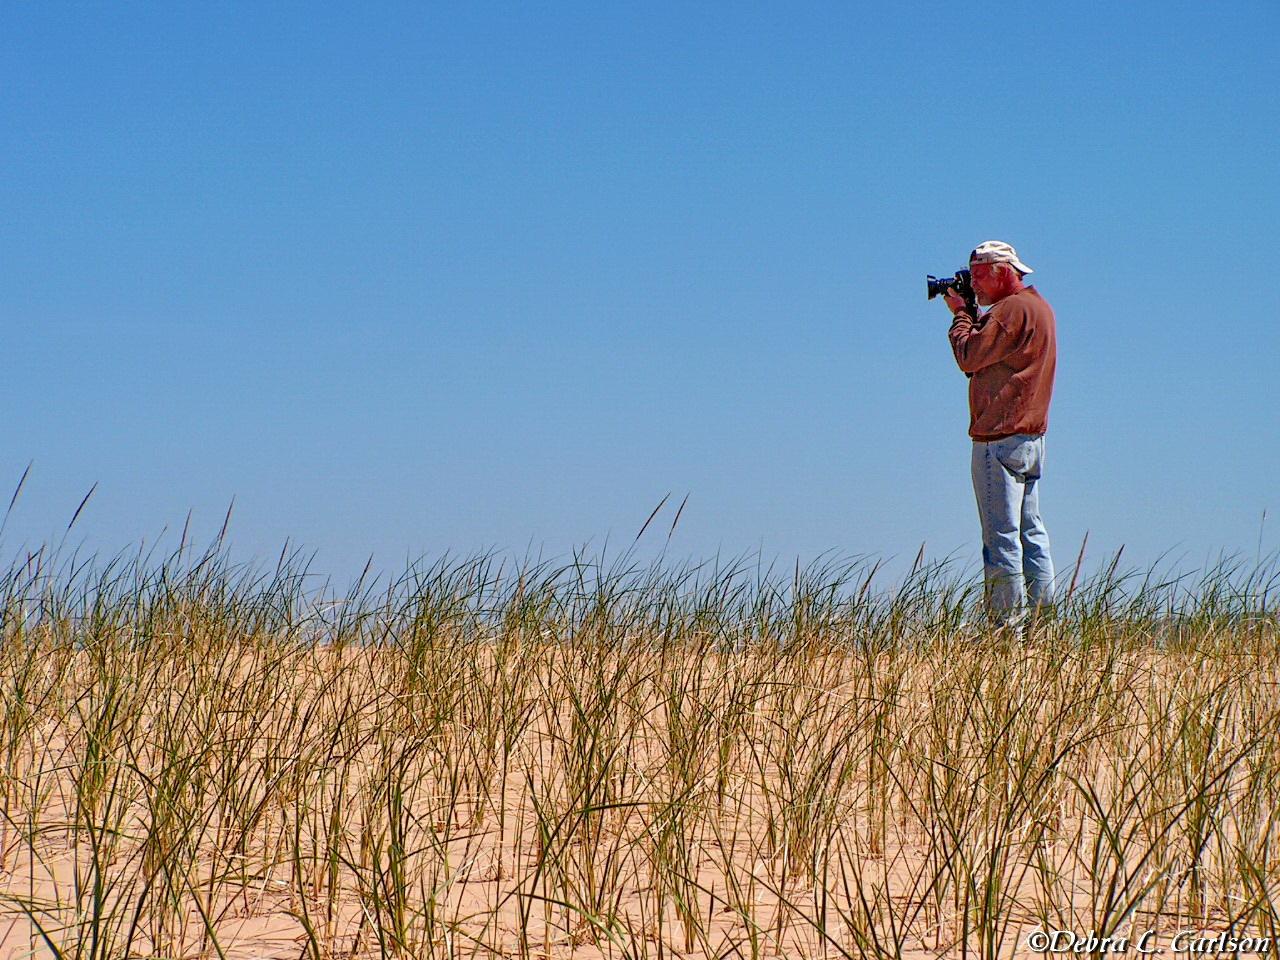 Mark-photographing-at-Sleeping-Bear-Dunes-©Debra L. Carlson.JPG